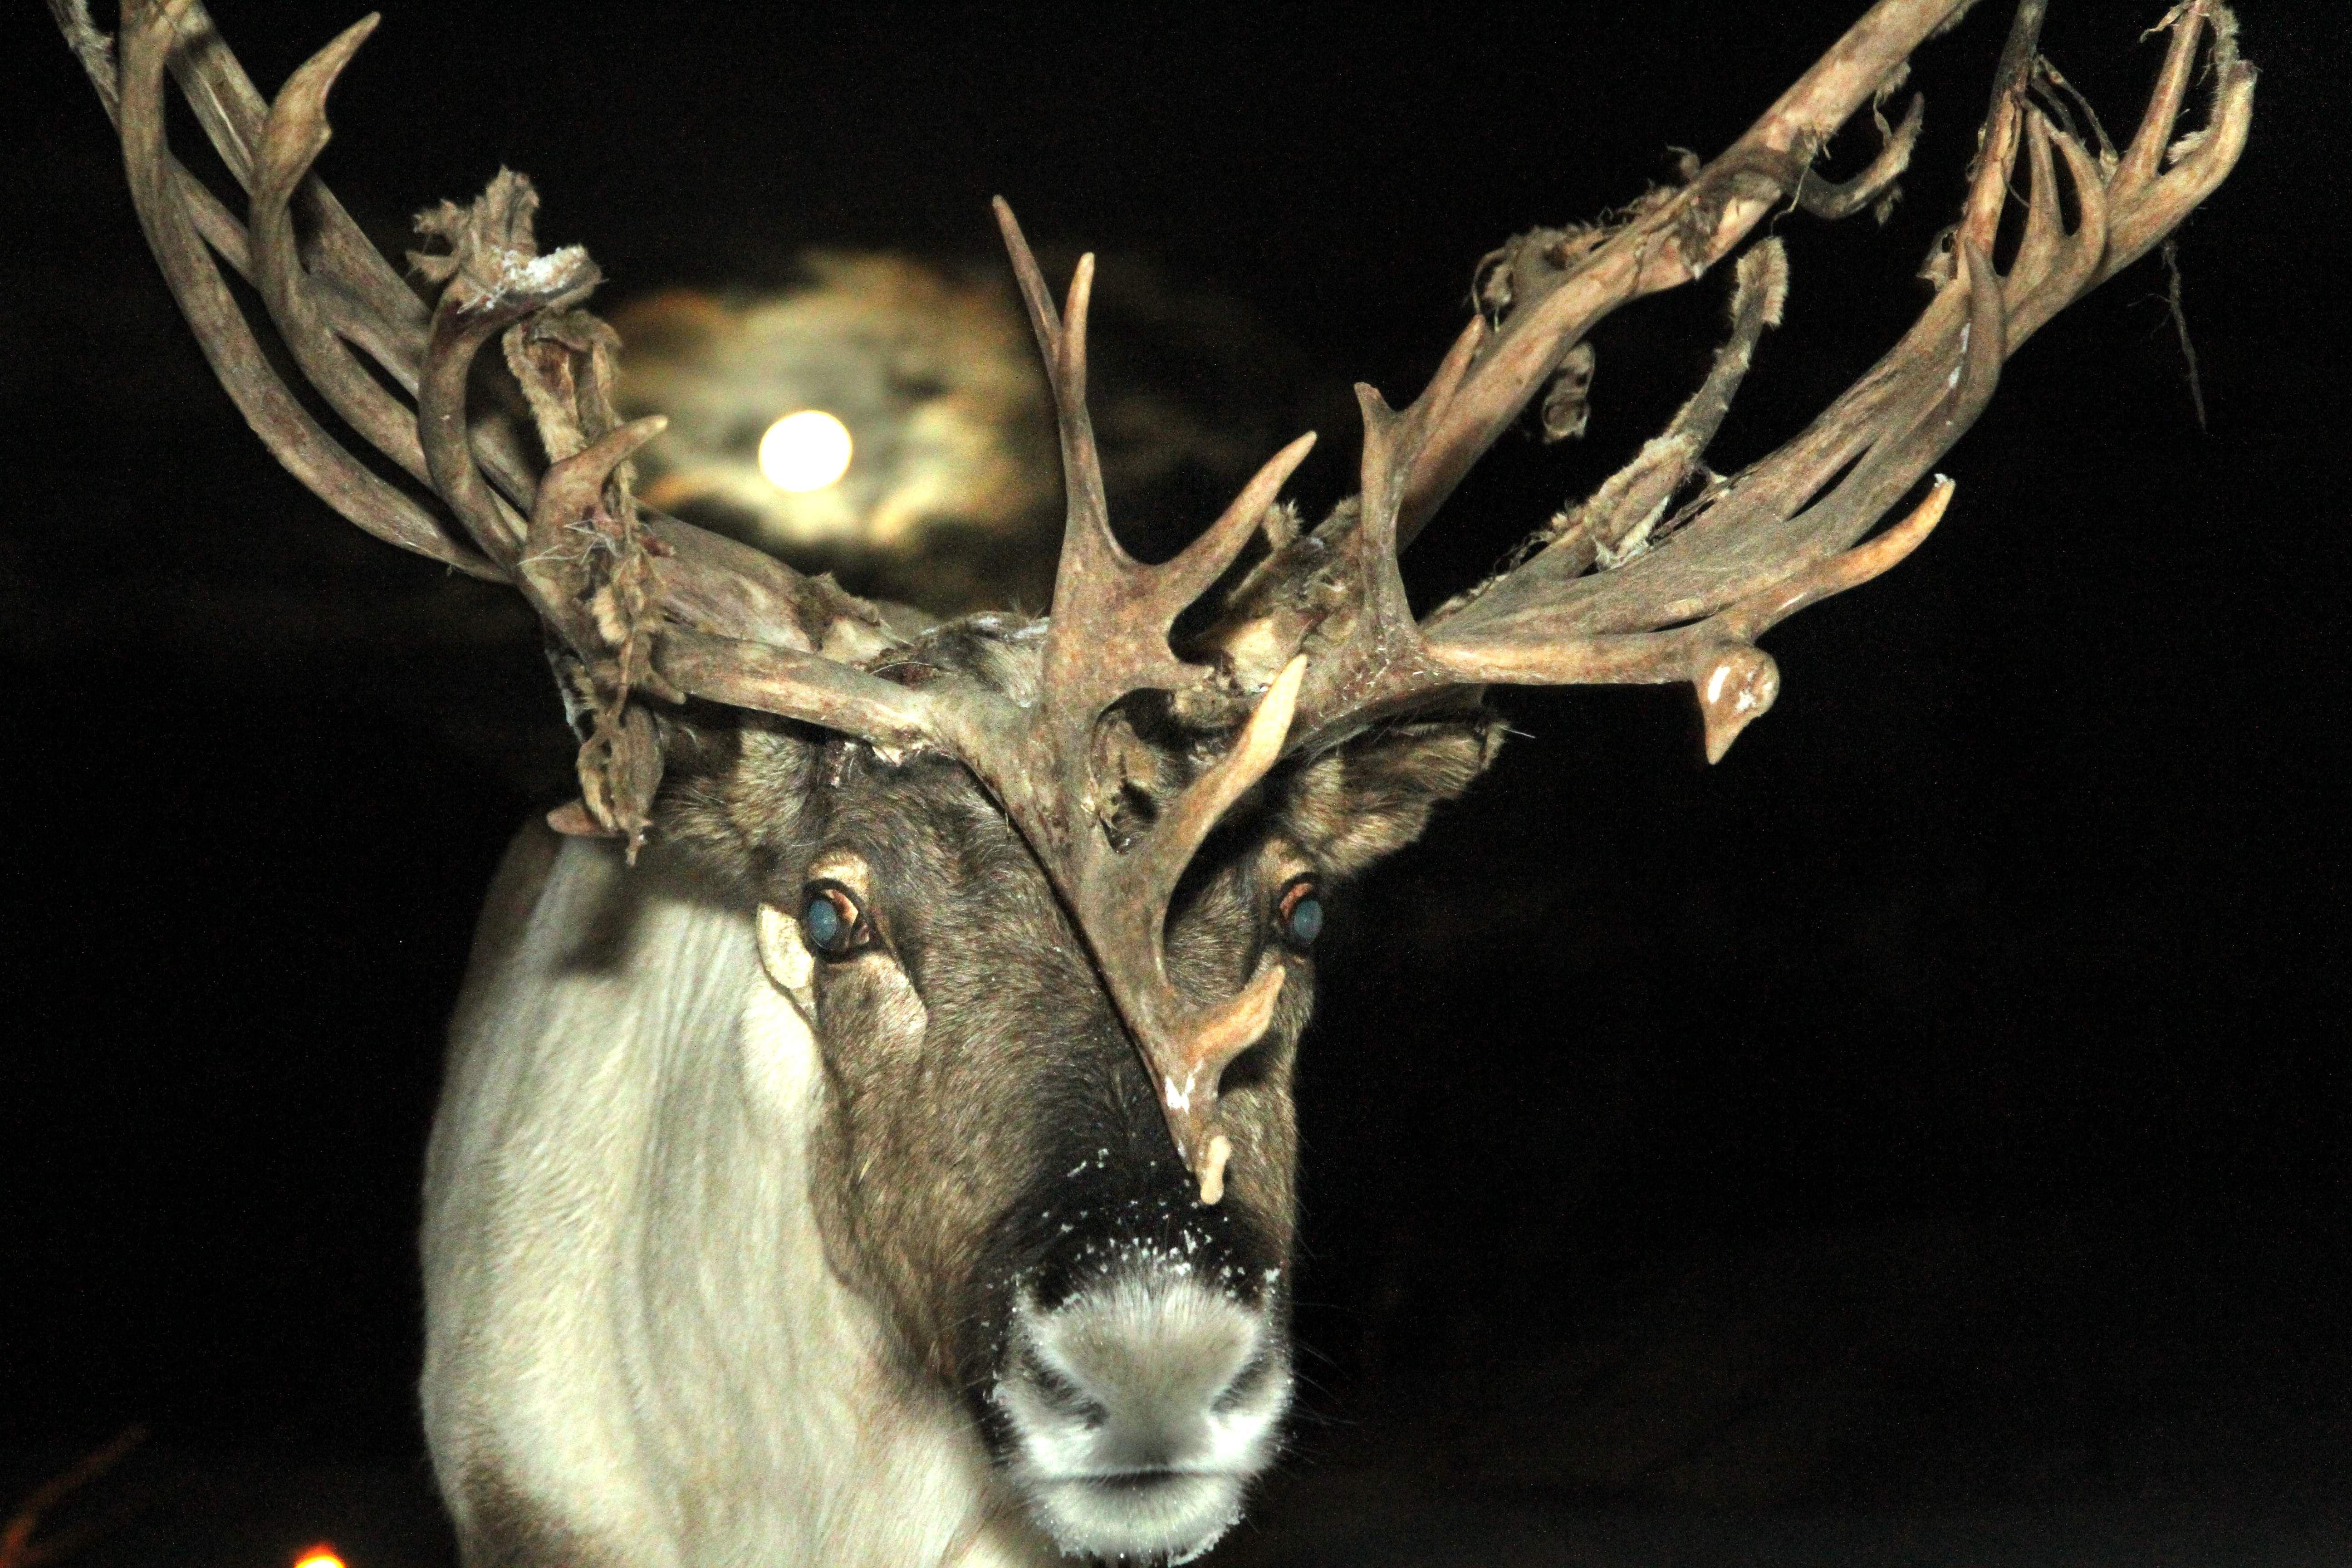 Snowman – Feed the Reindeer – Destination Snowman